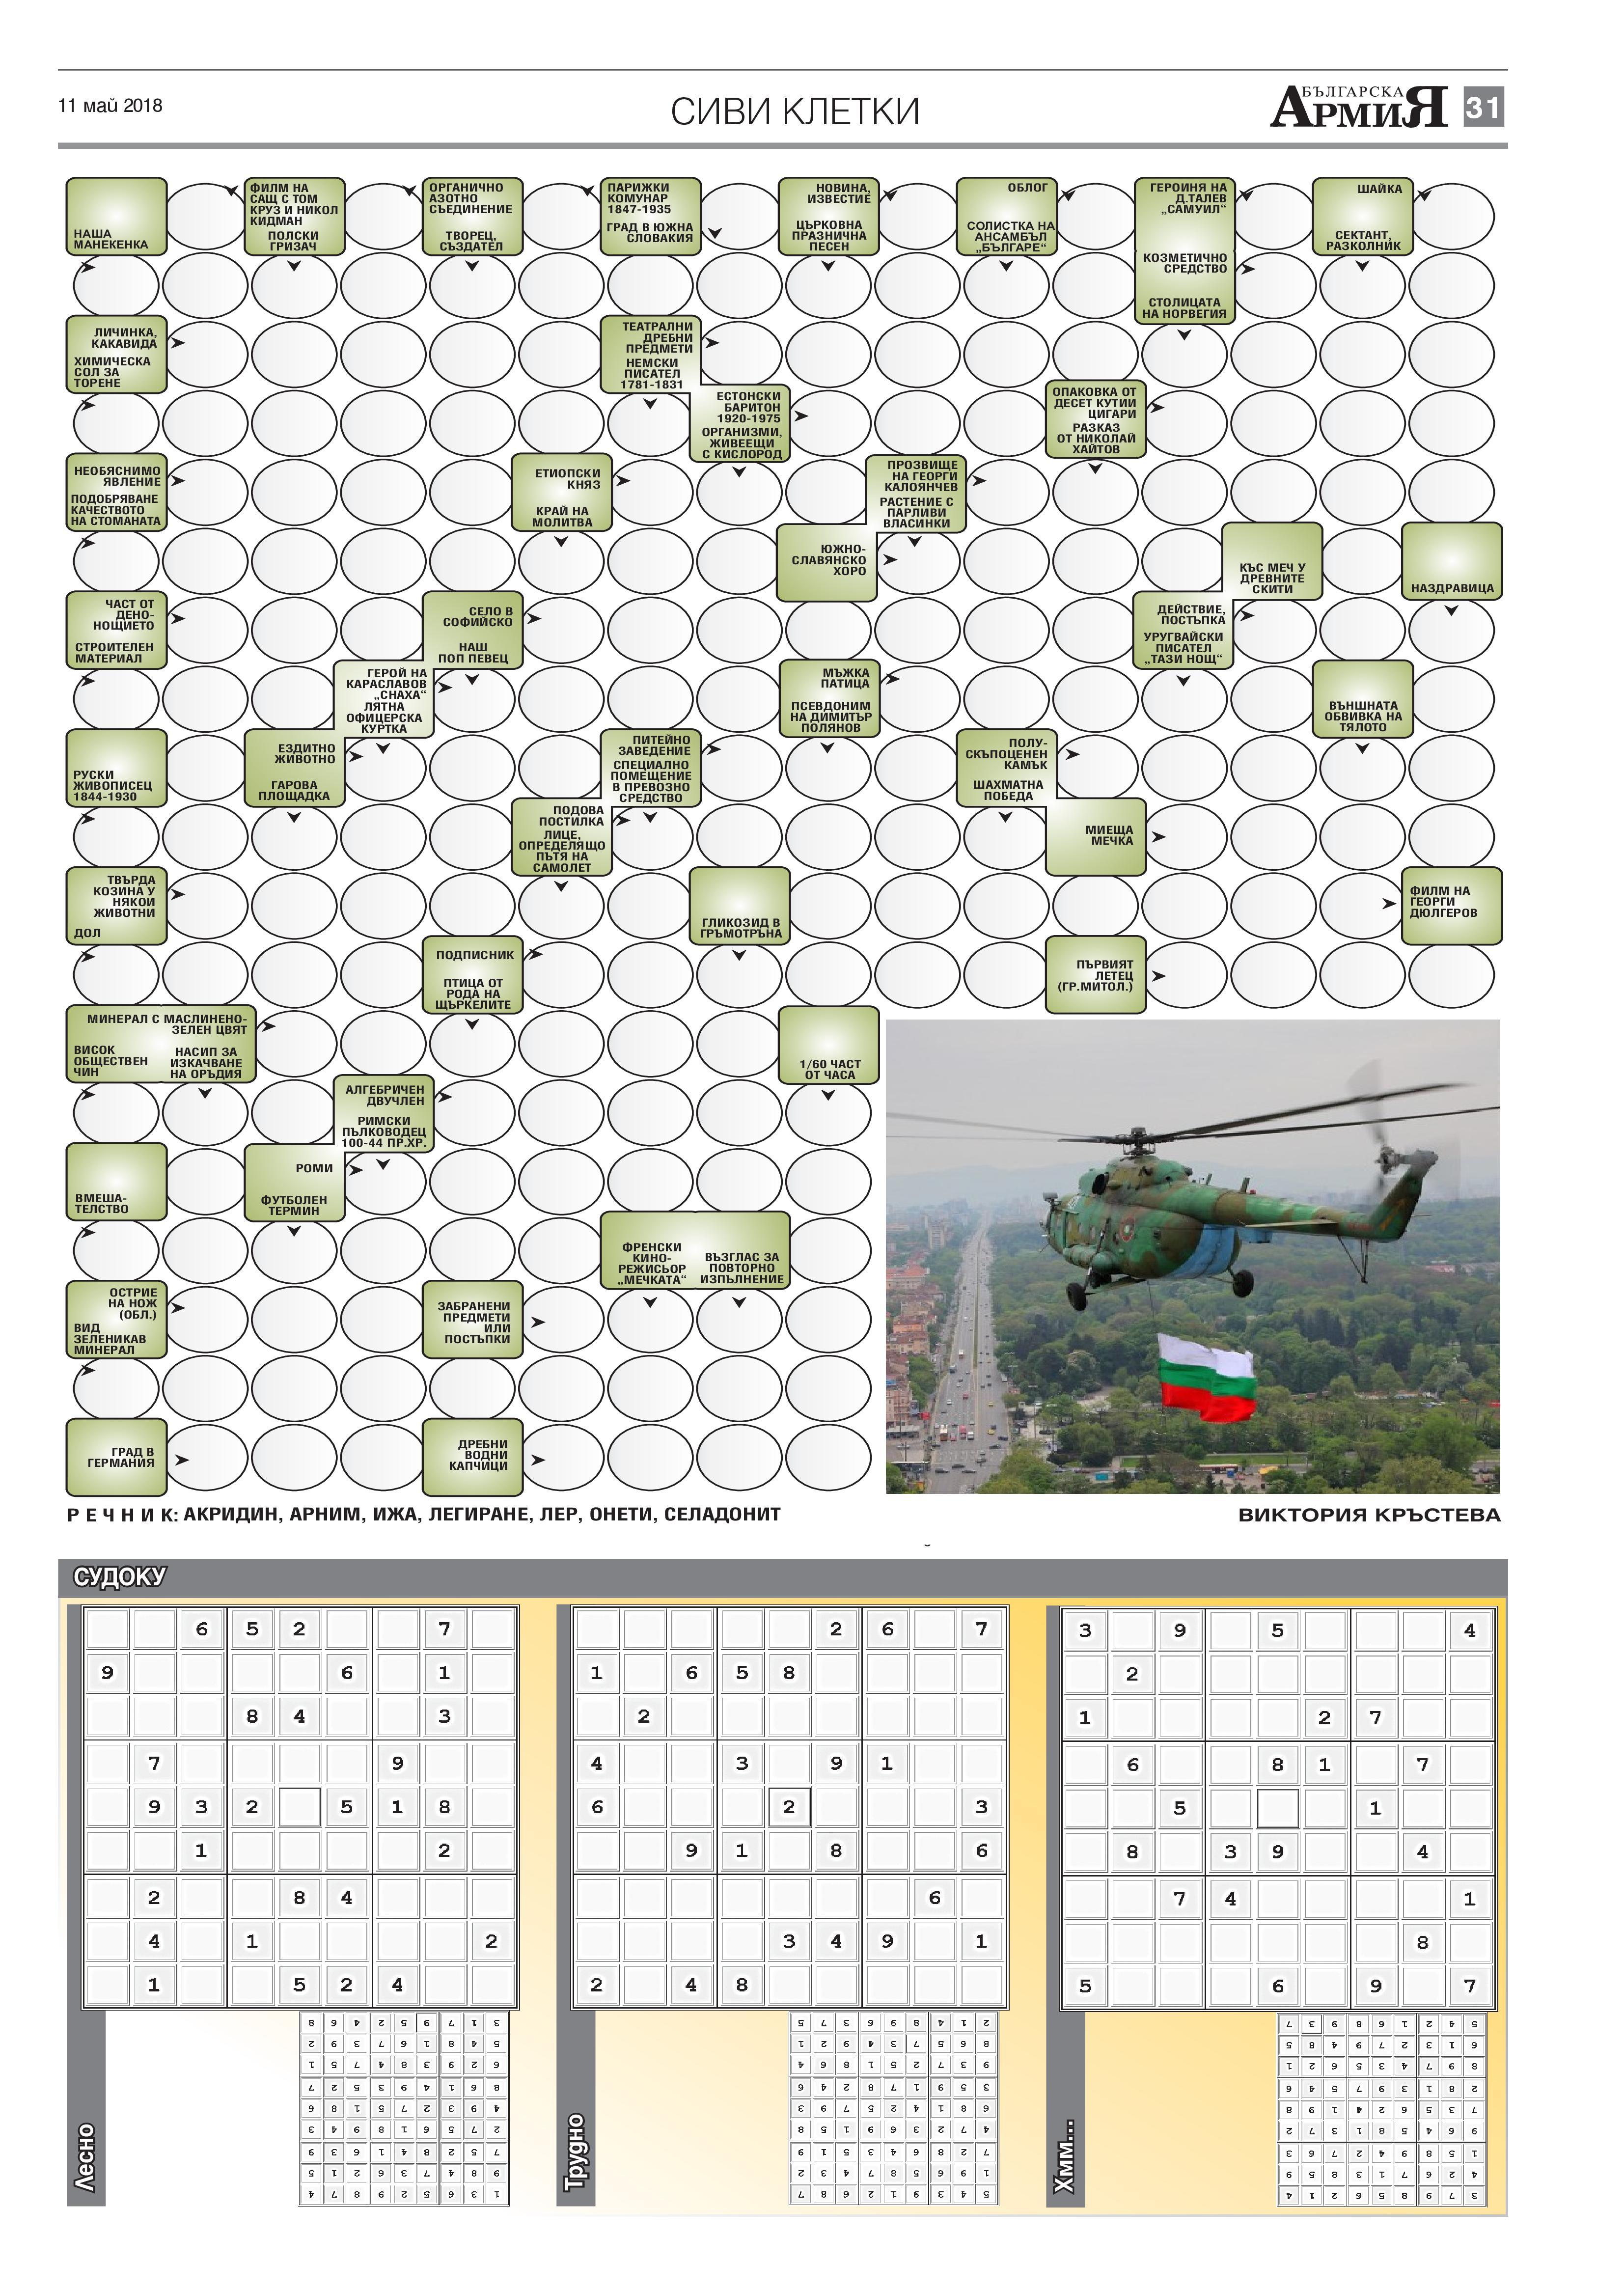 https://armymedia.bg/wp-content/uploads/2015/06/31-20.jpg